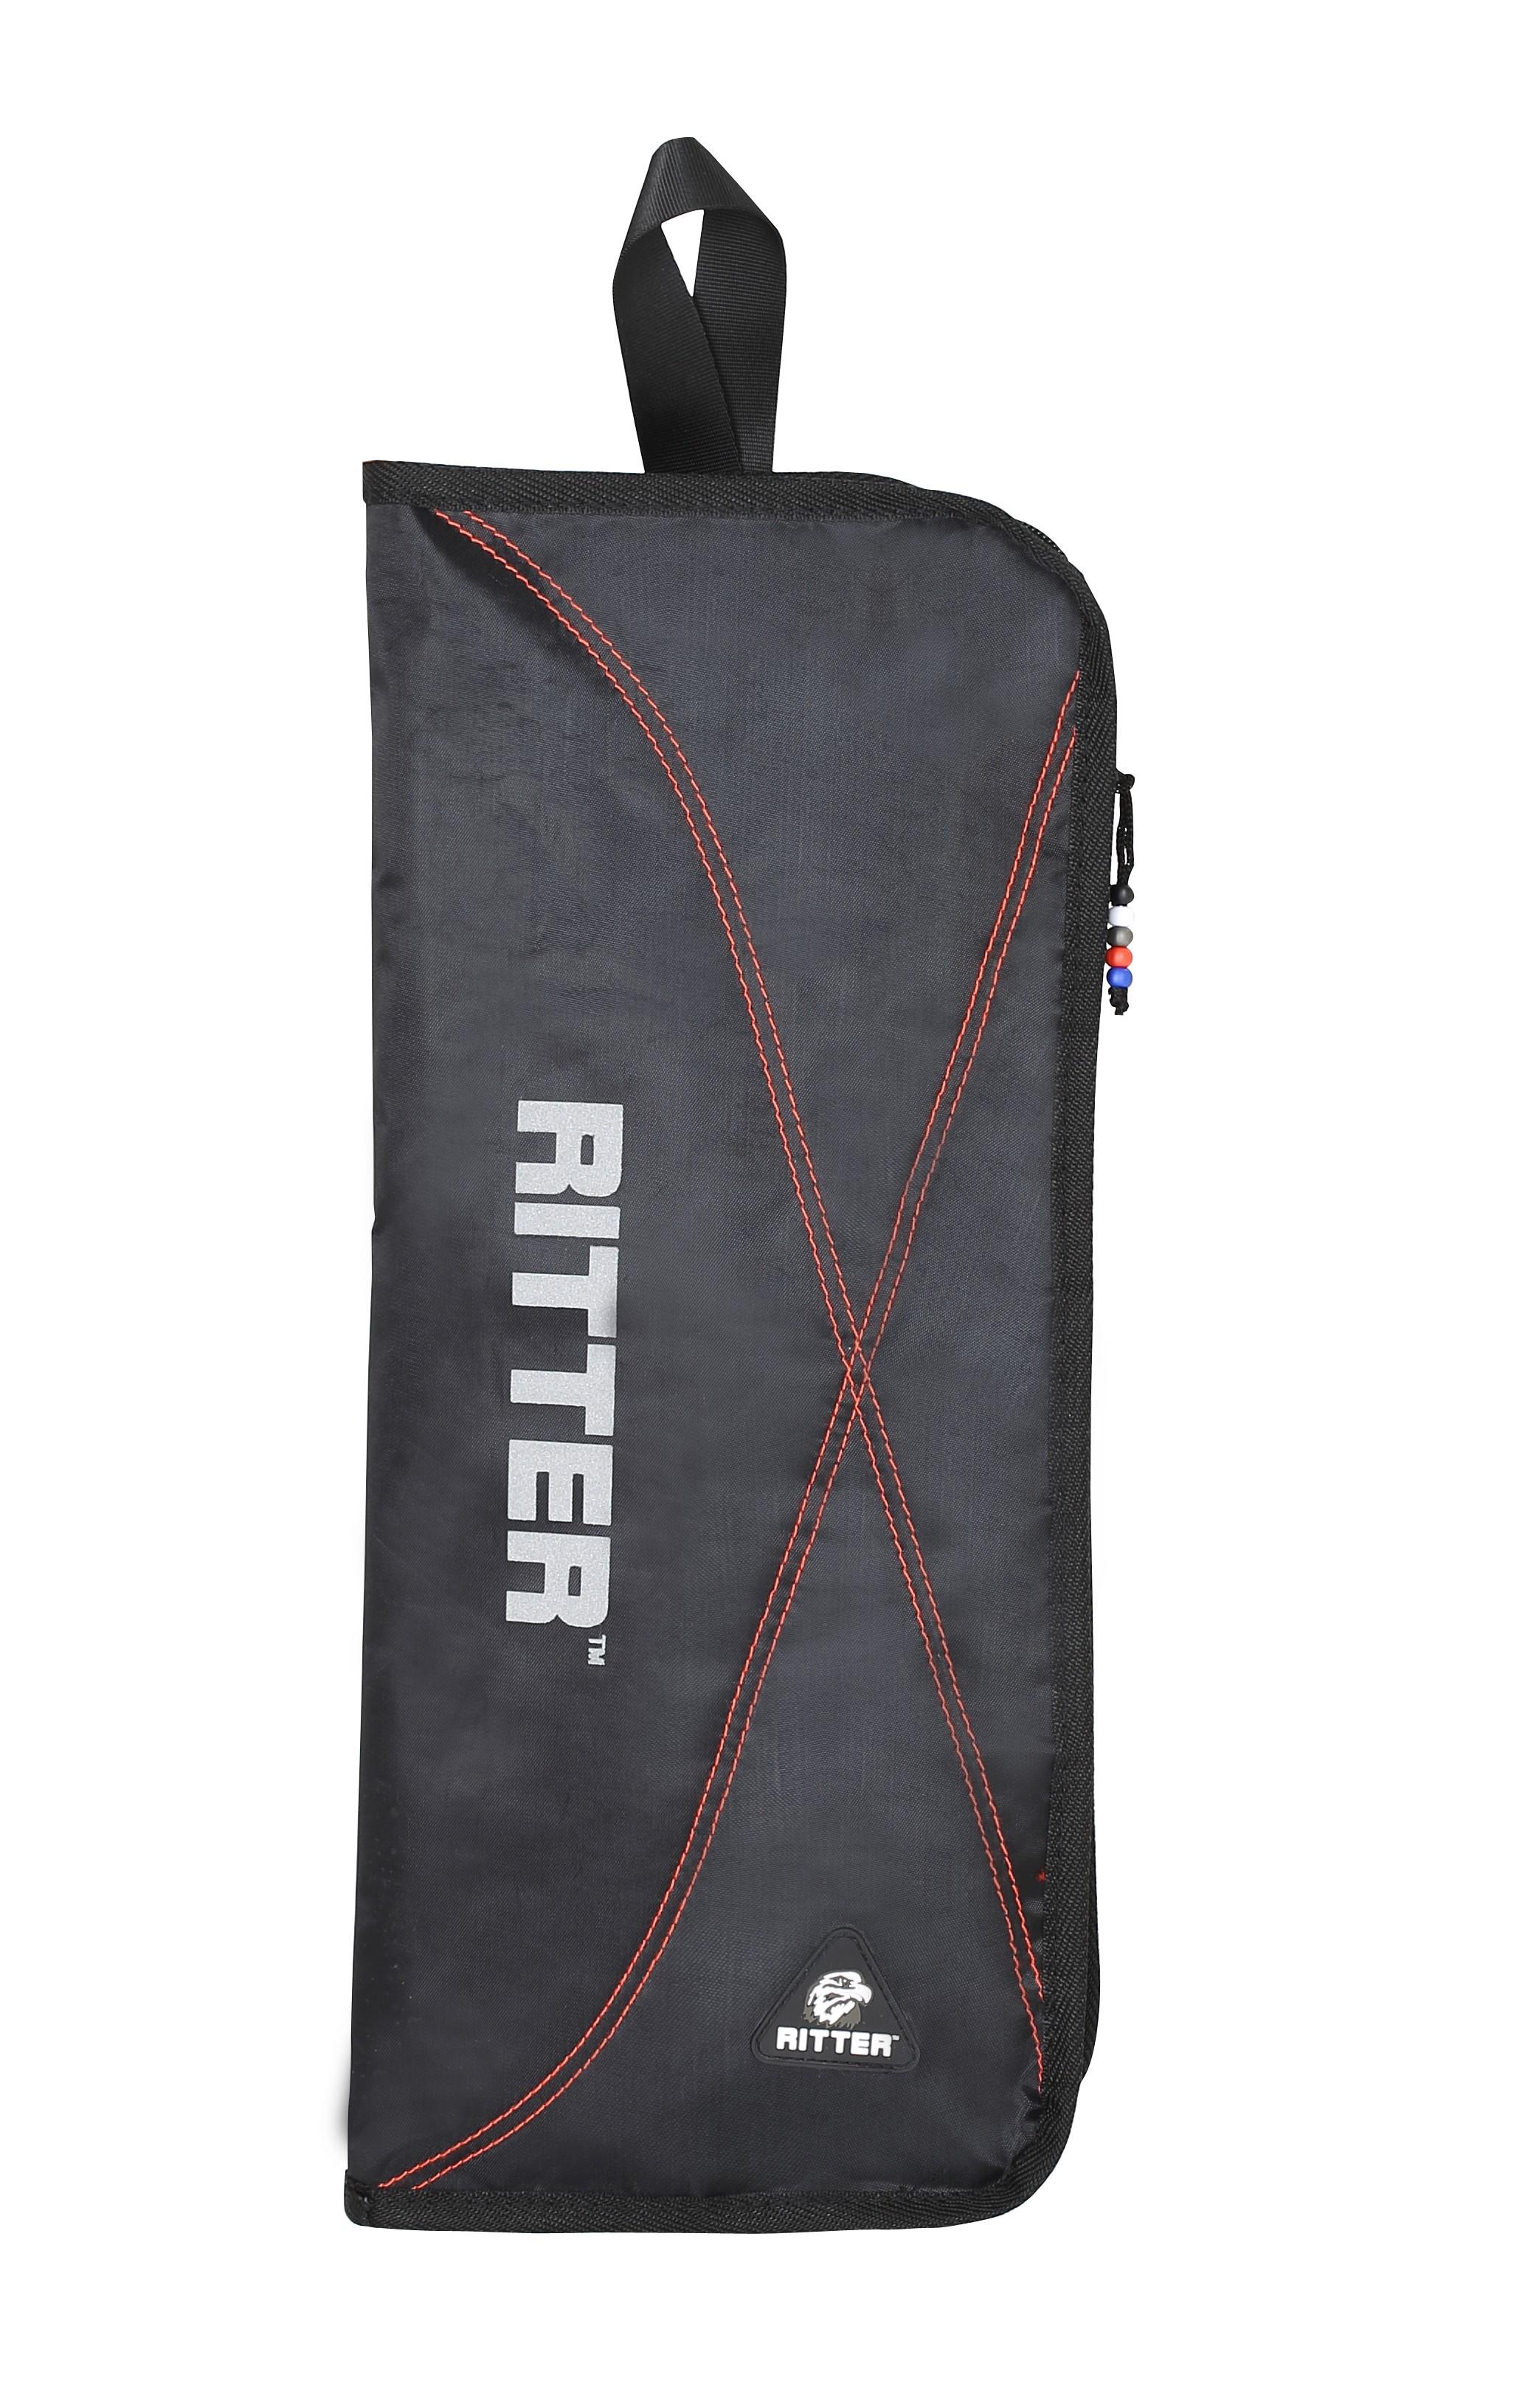 Ritter RDP2-S/BRD Stick Bag - Black/Red